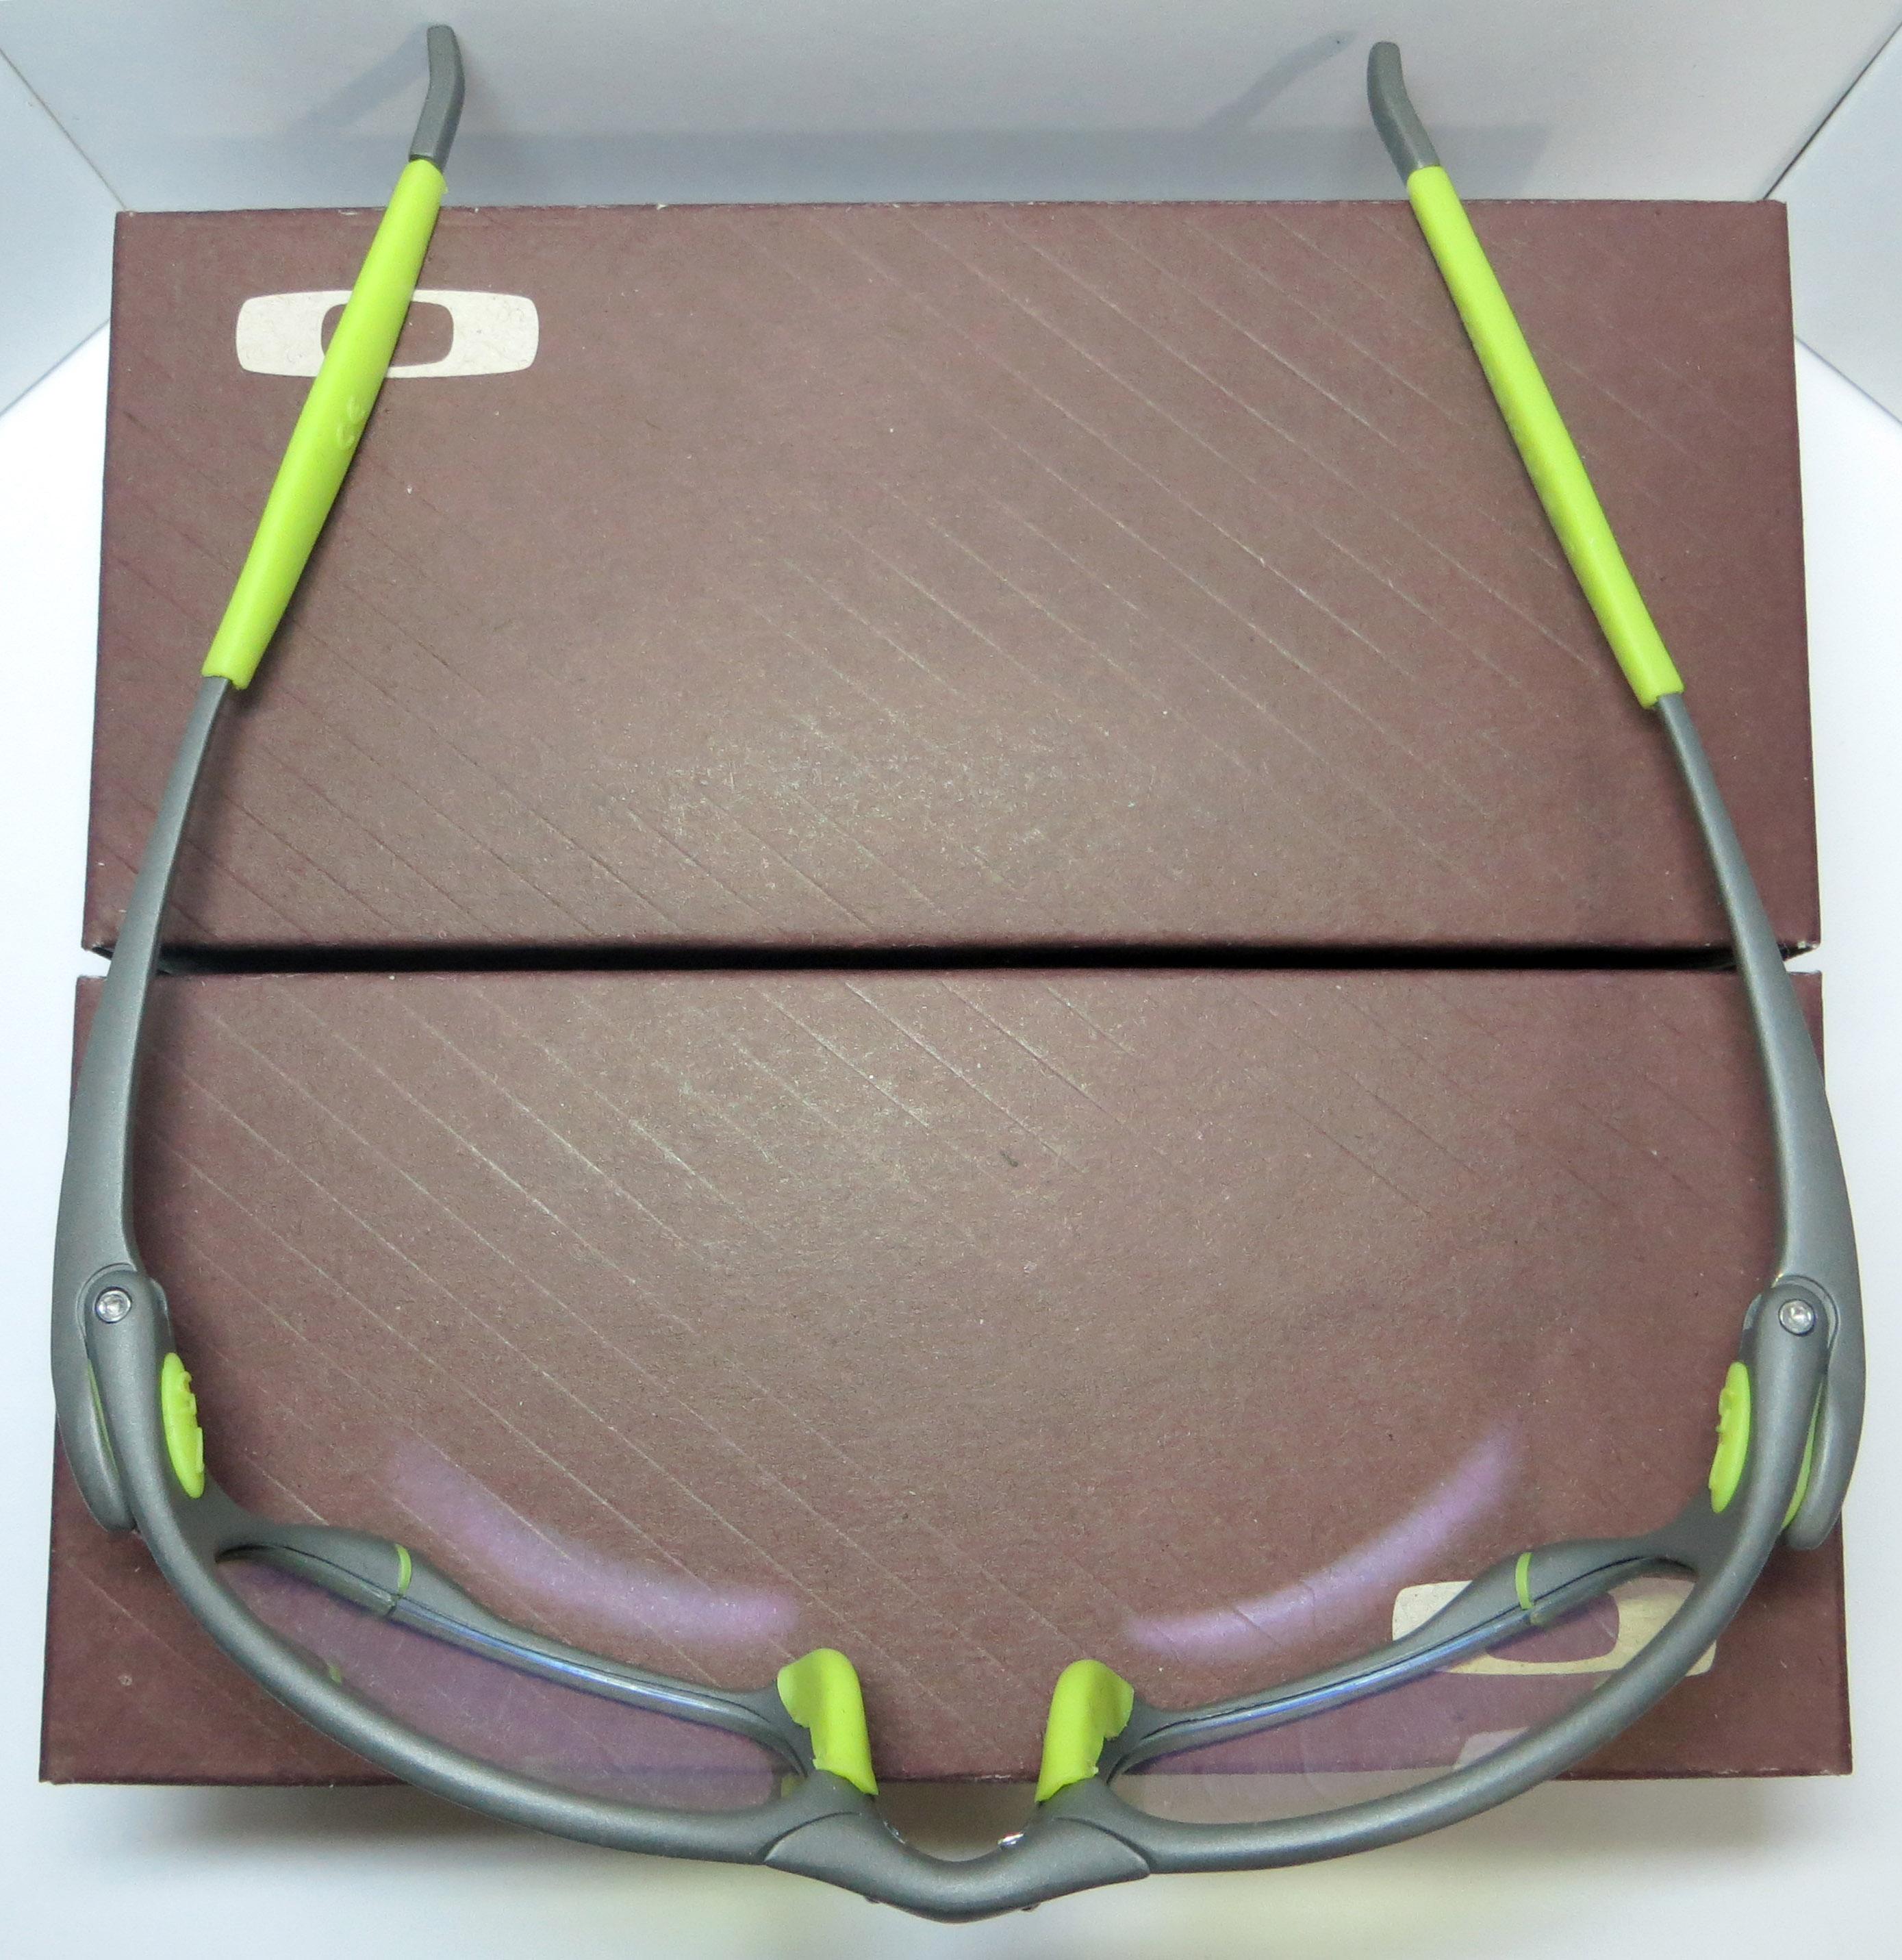 e8dfb687b821e Óculos Oakley Juliet - X-Metal   Clear Verde   Borrachinhas Verdes ...